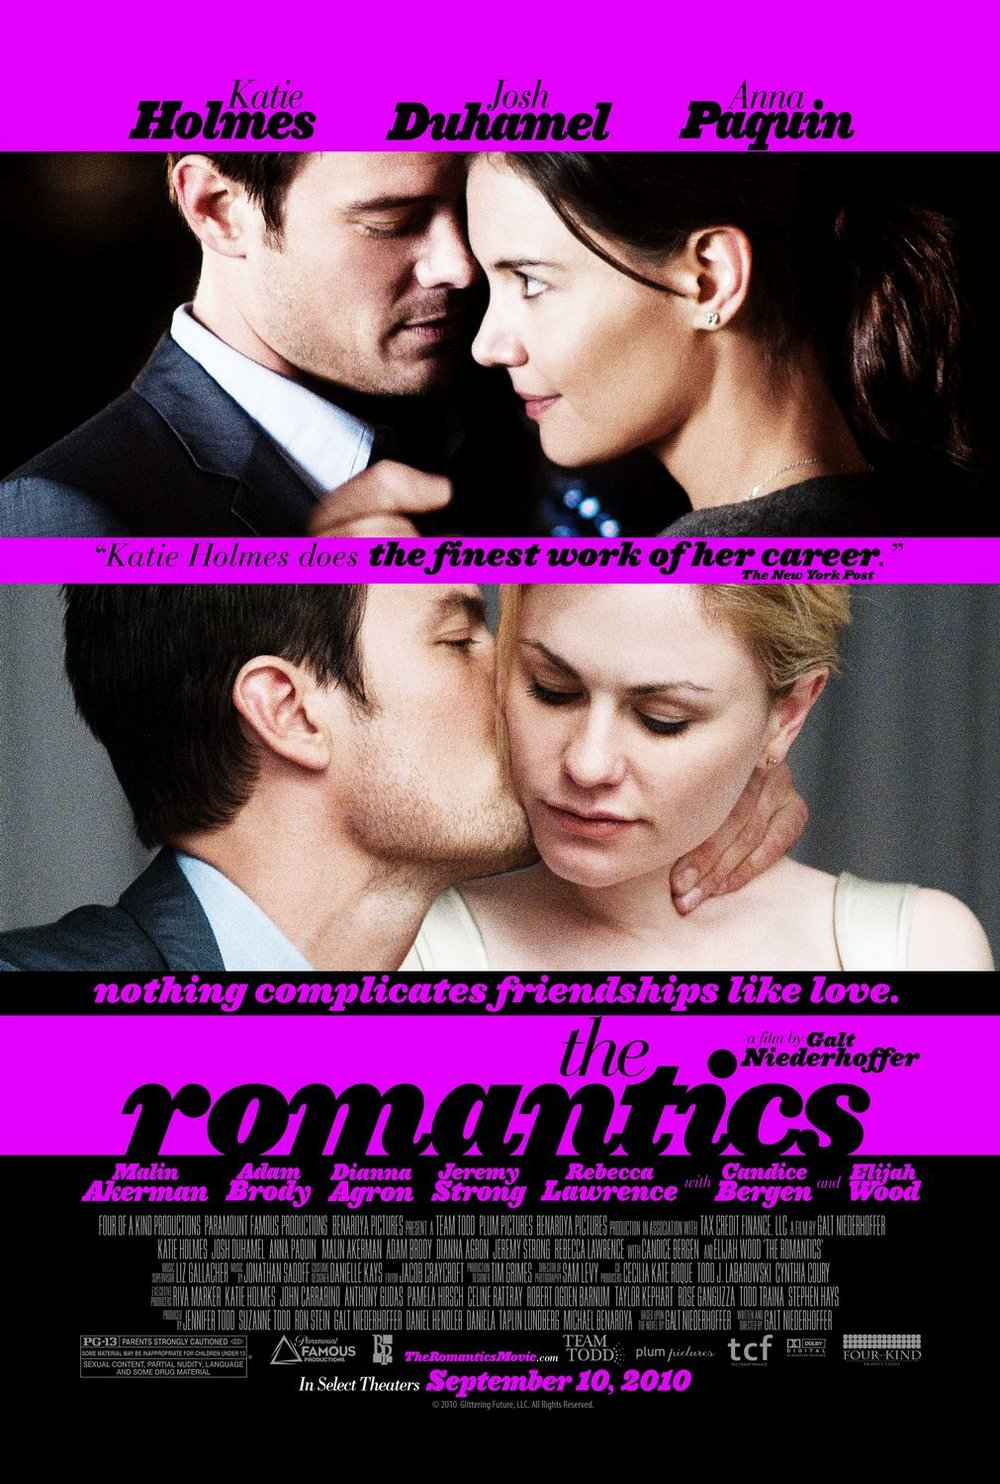 romantics_ver2_xlg.jpg